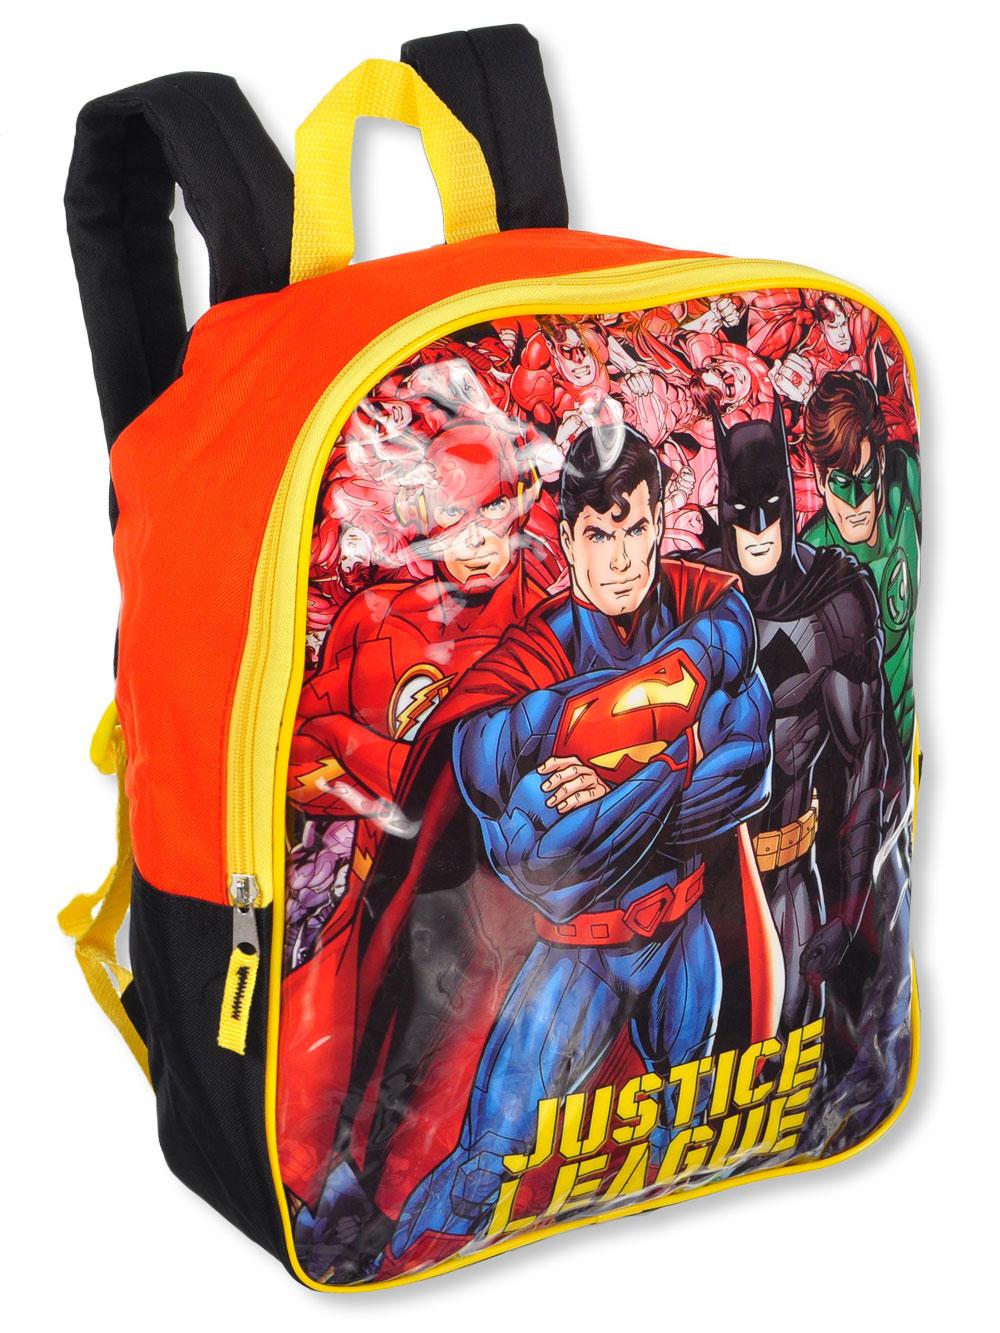 87efec7f3490 Justice League Backpack